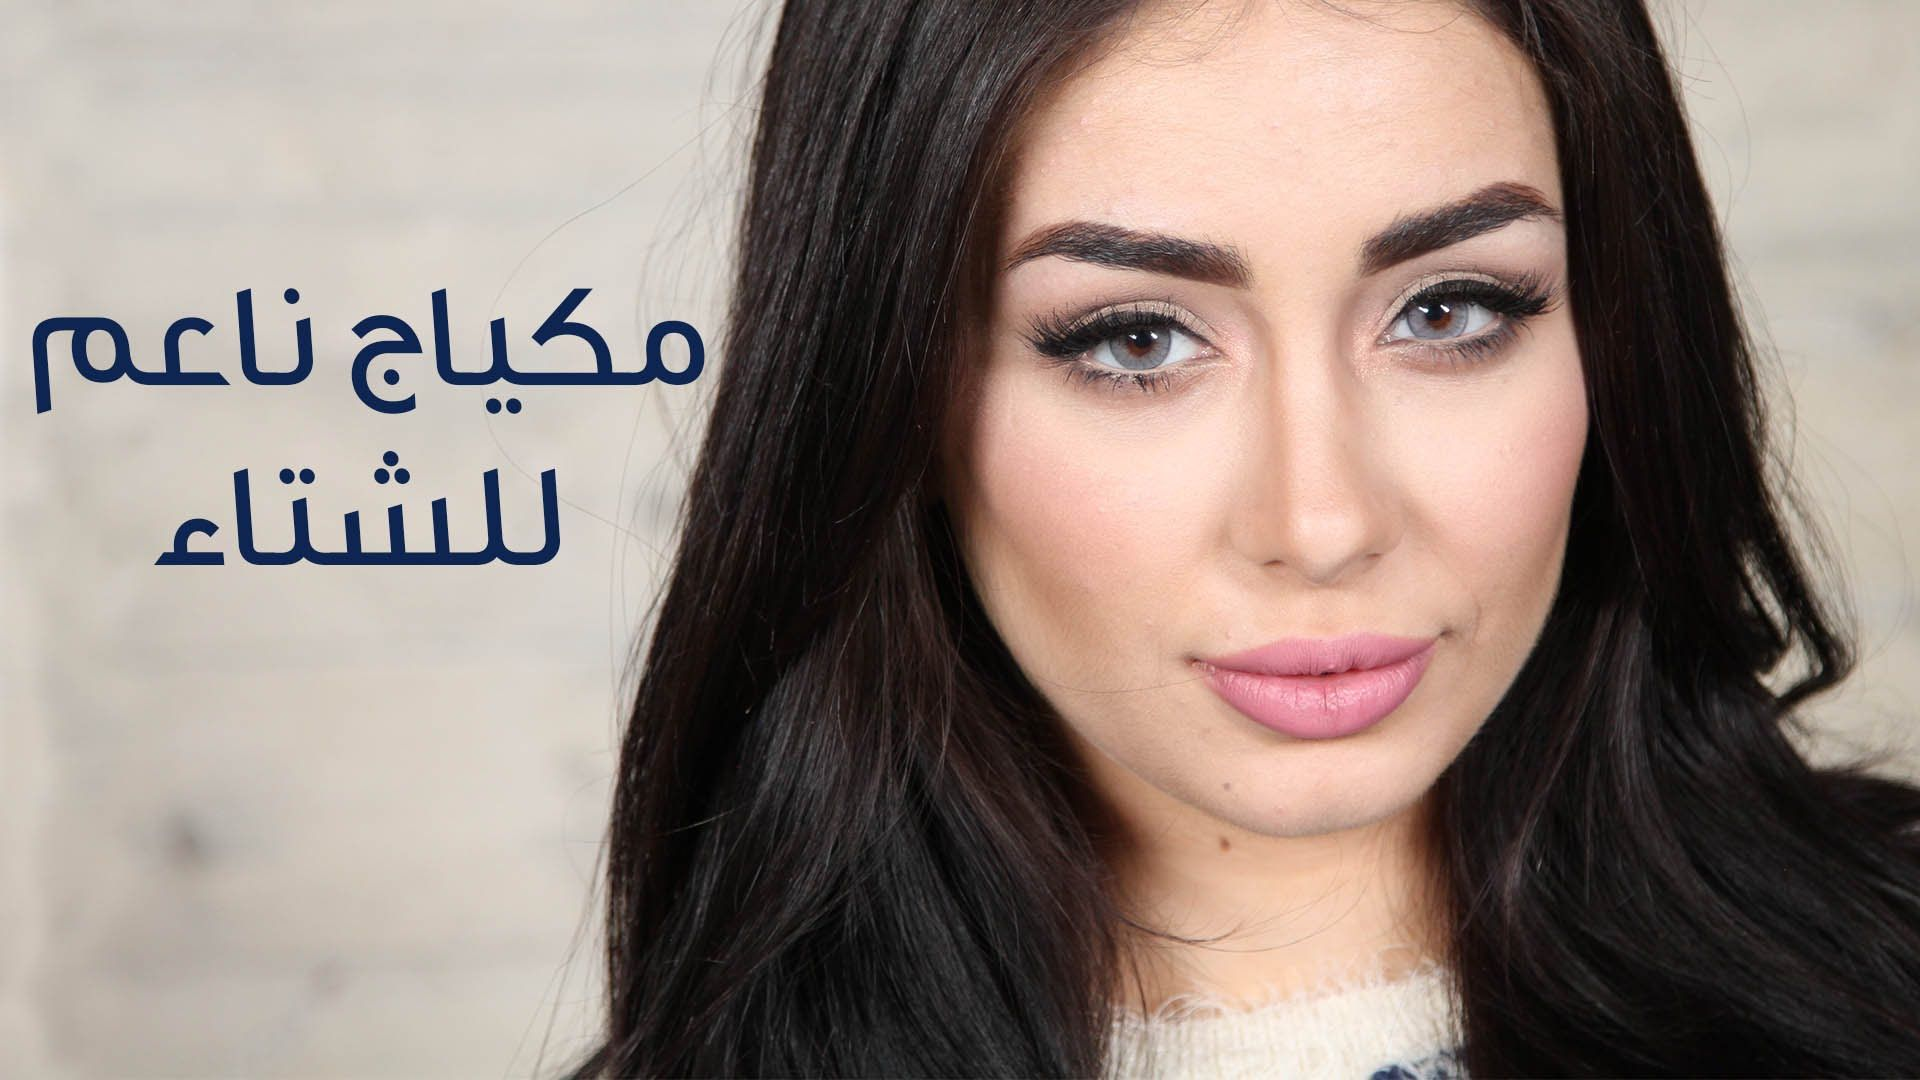 المكياج الناعم Makeup Spray Pinterest Makeup Learn Makeup